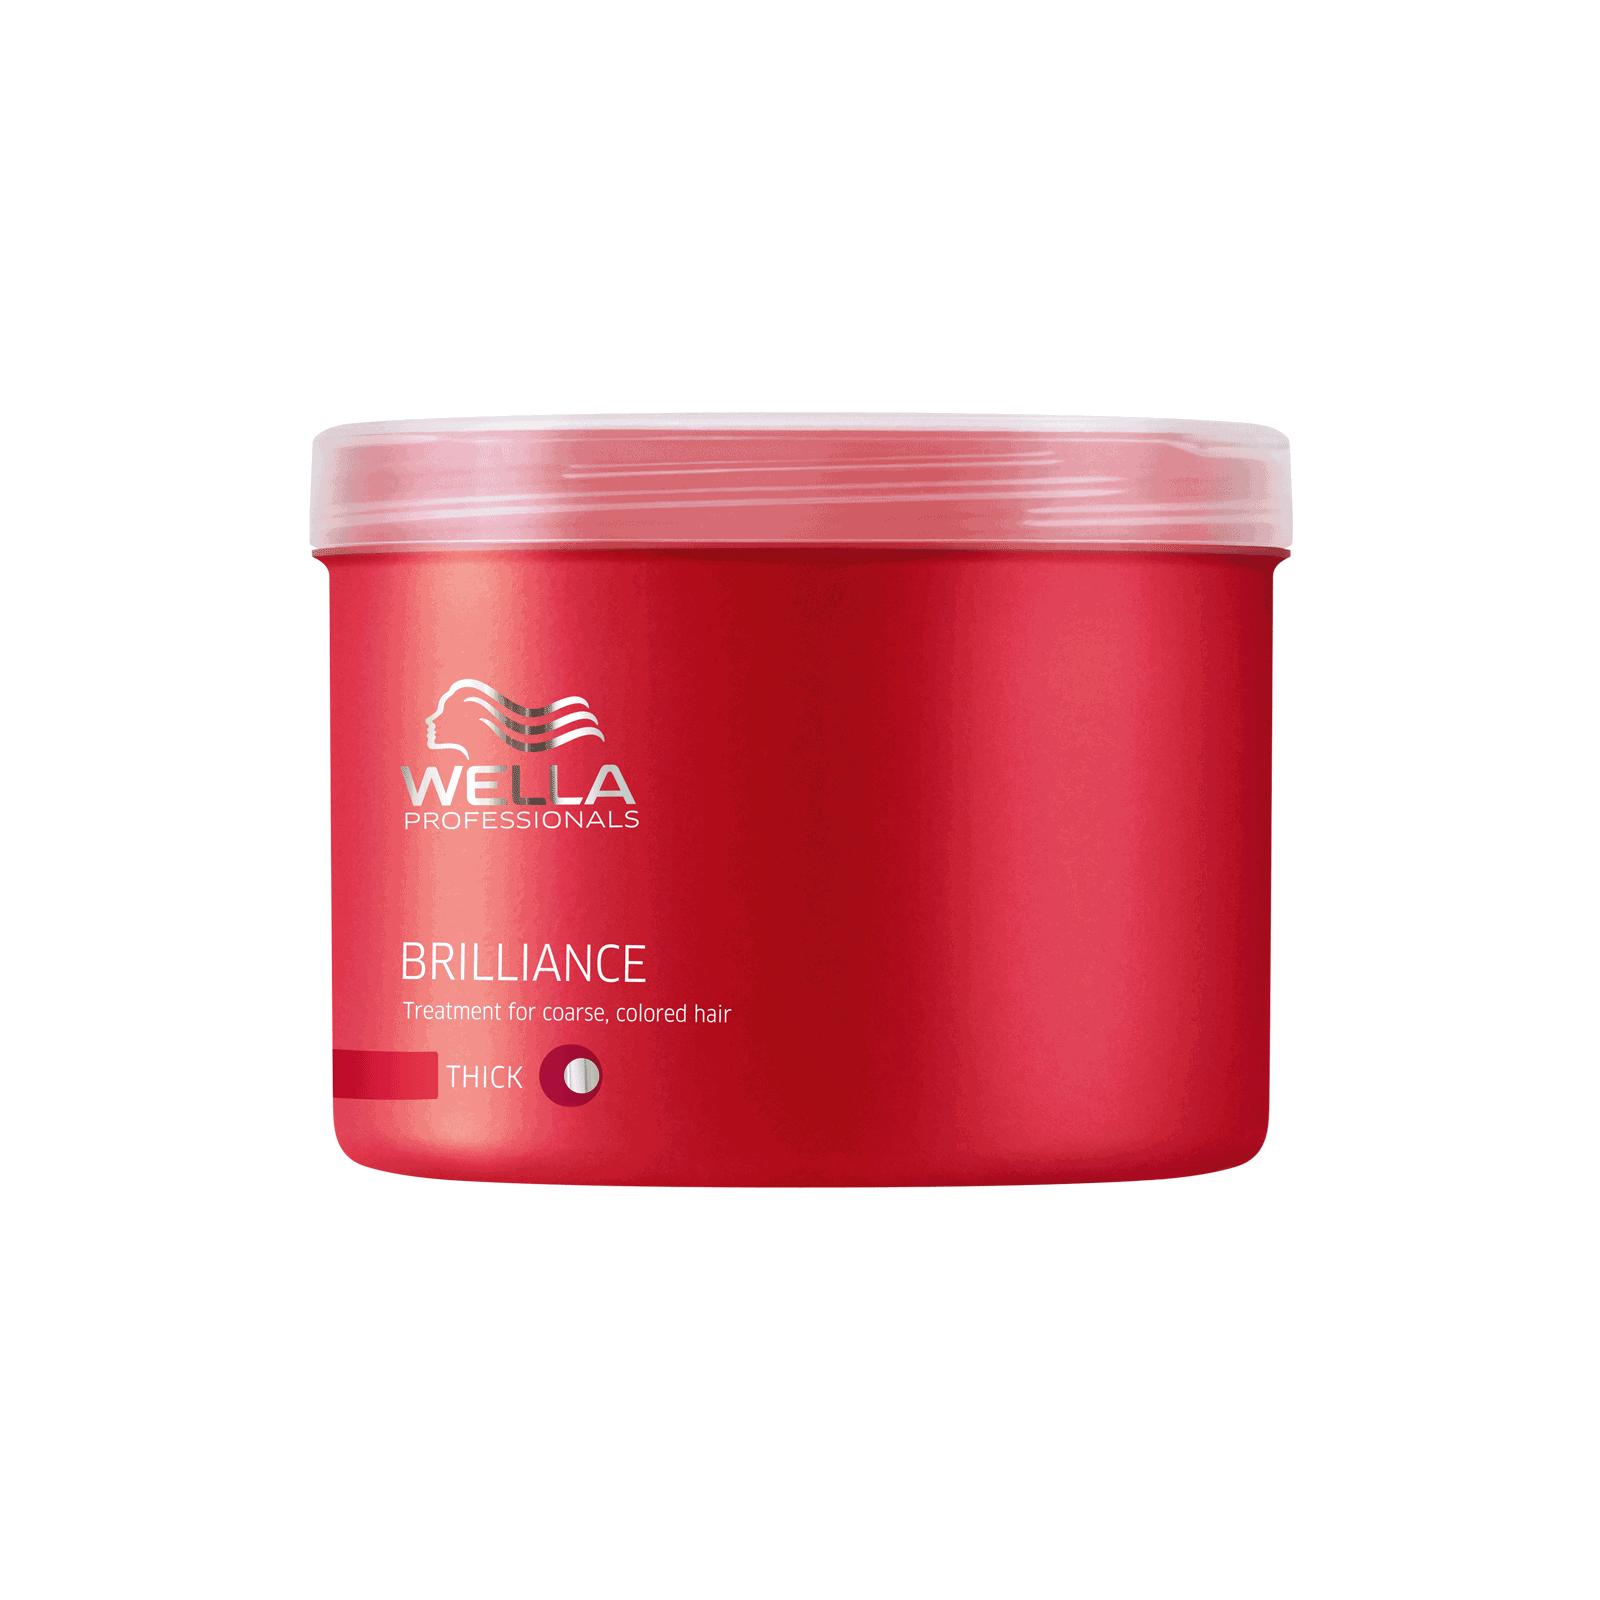 Brilliance Treatment For Coarse Colored Hair Wella Cosmoprof